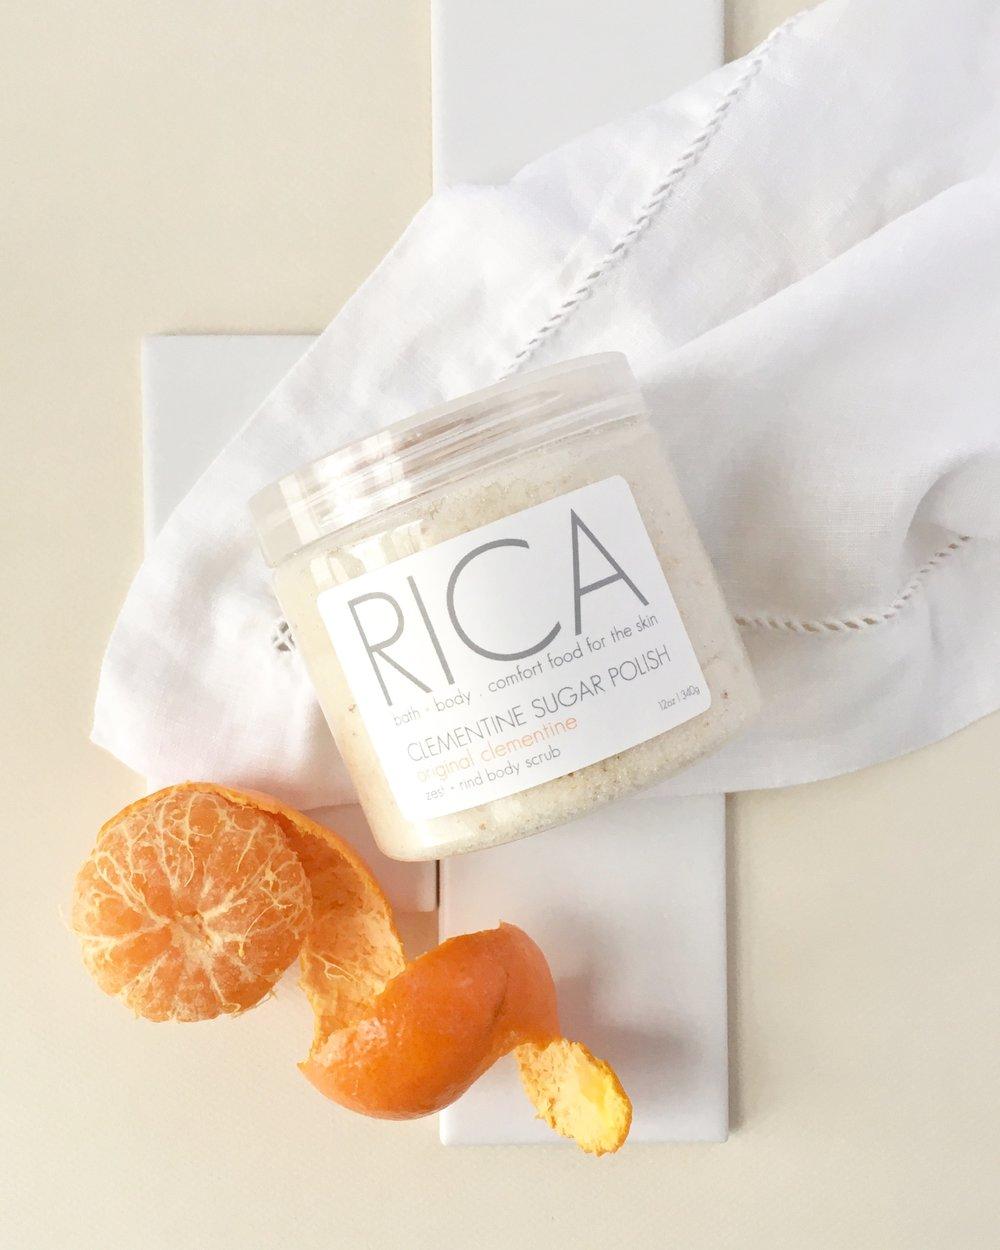 RICA bath + body Clementine Sugar Polish with Unpeeled Clementine.JPG